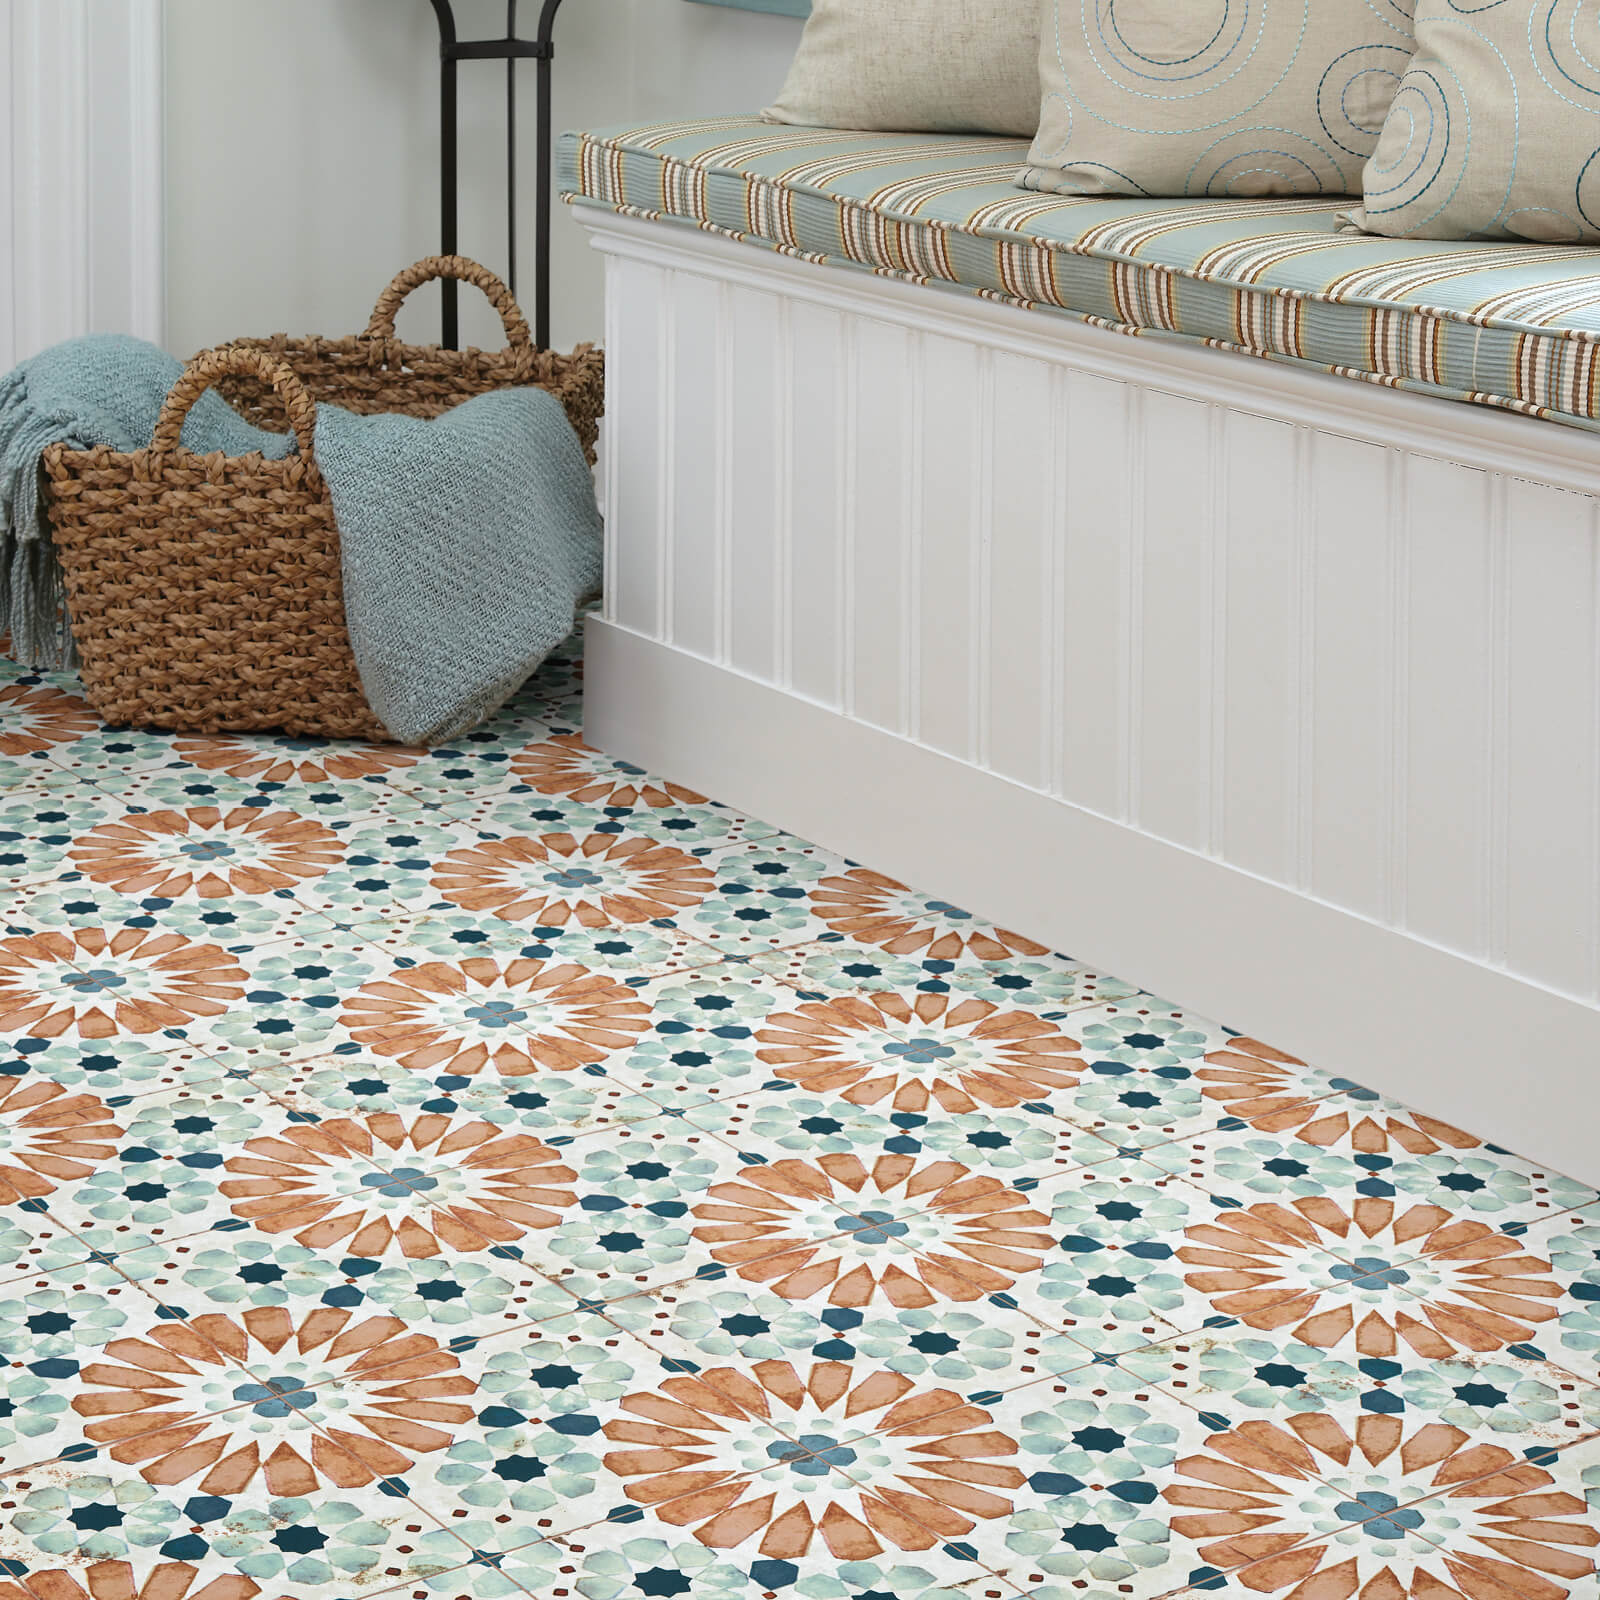 Islander Tiles | McSwain Carpet & Floors